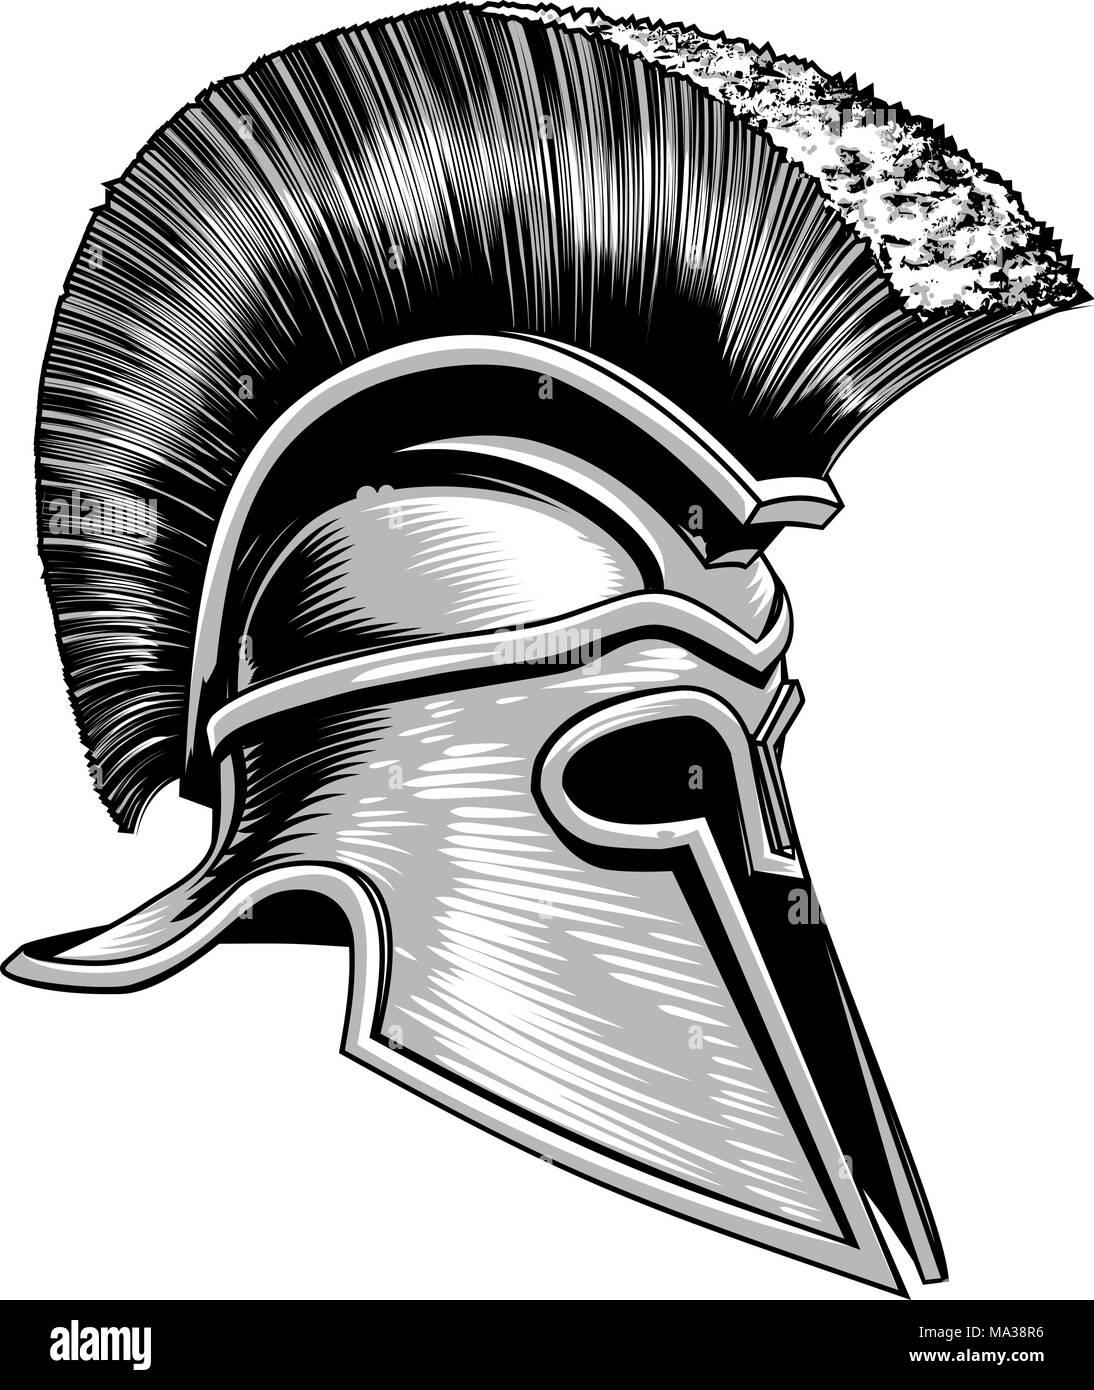 b51b4dd9d Spartan Helmet Black and White Stock Photos & Images - Alamy